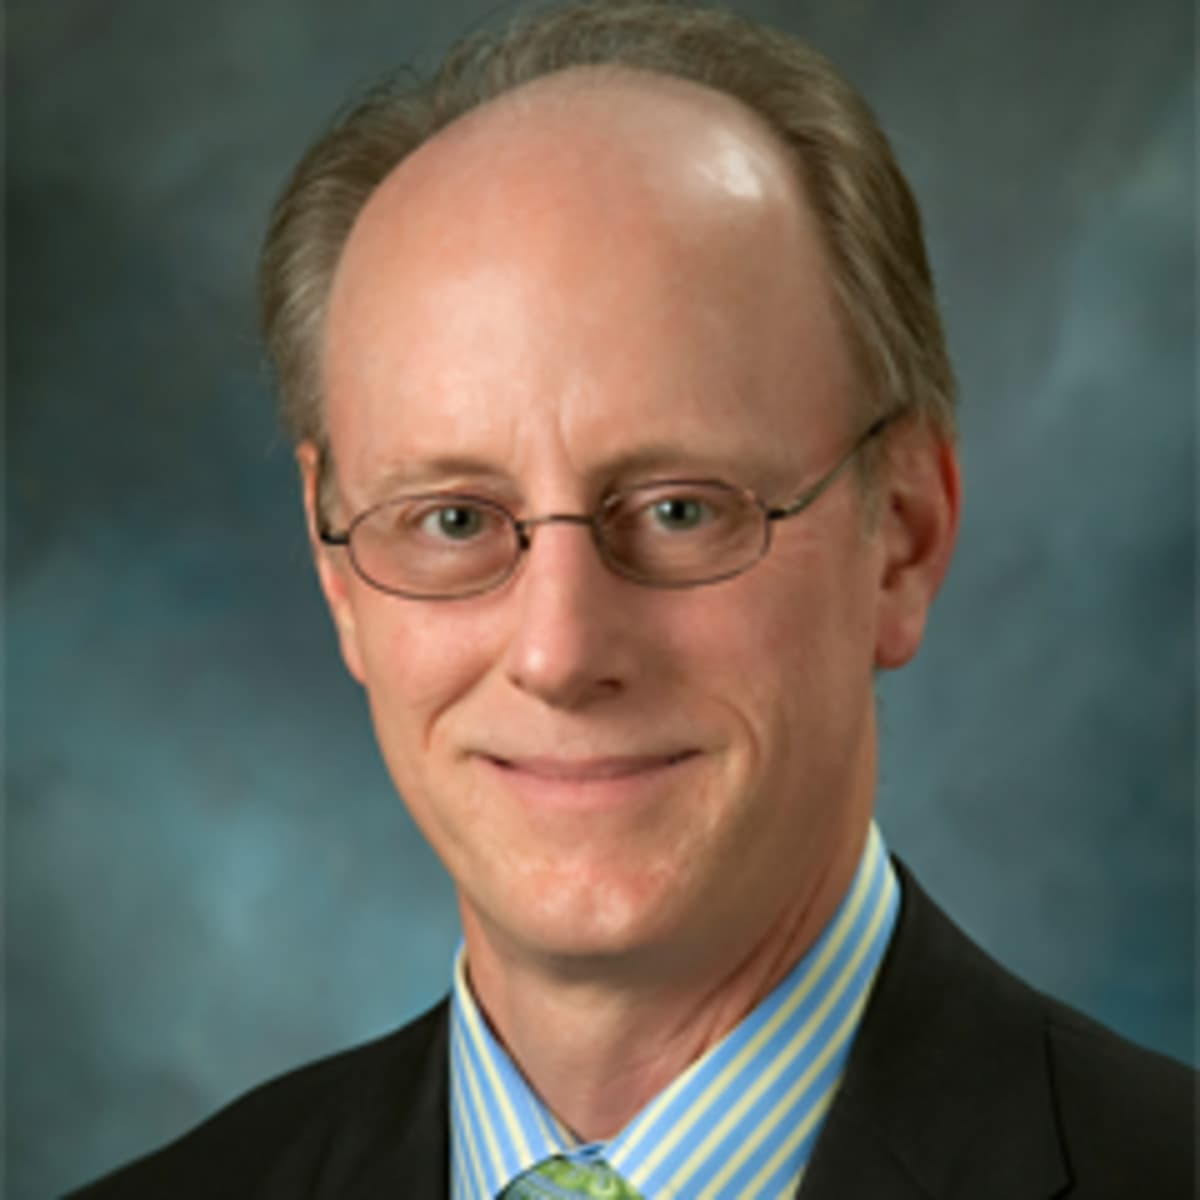 Credentials Dr Mark Hermanson Md Bettendorf Ia